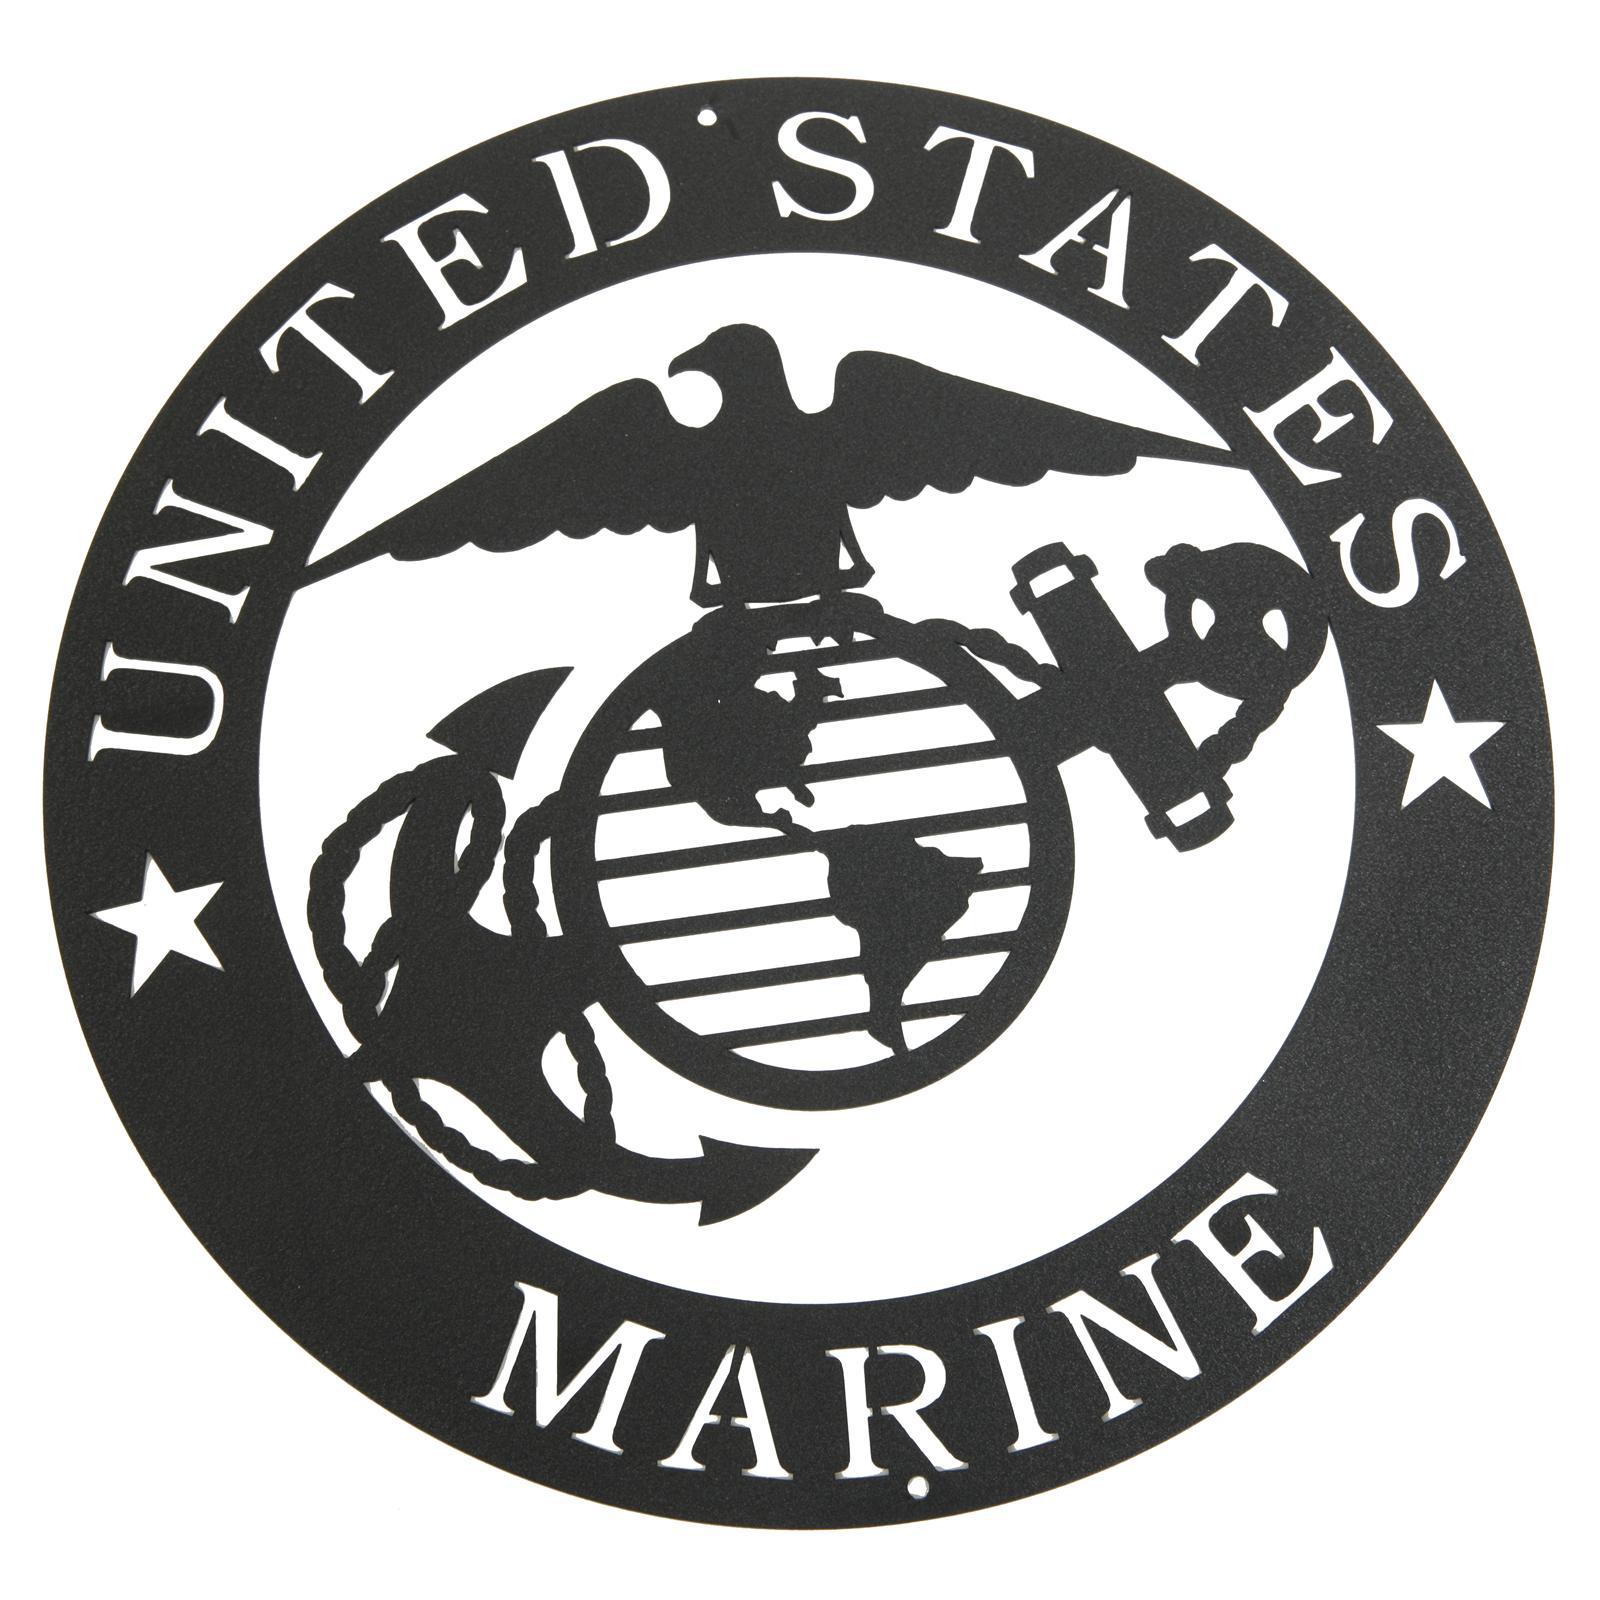 1600x1600 Marines Corps Emblem Metal Silhouette 3025